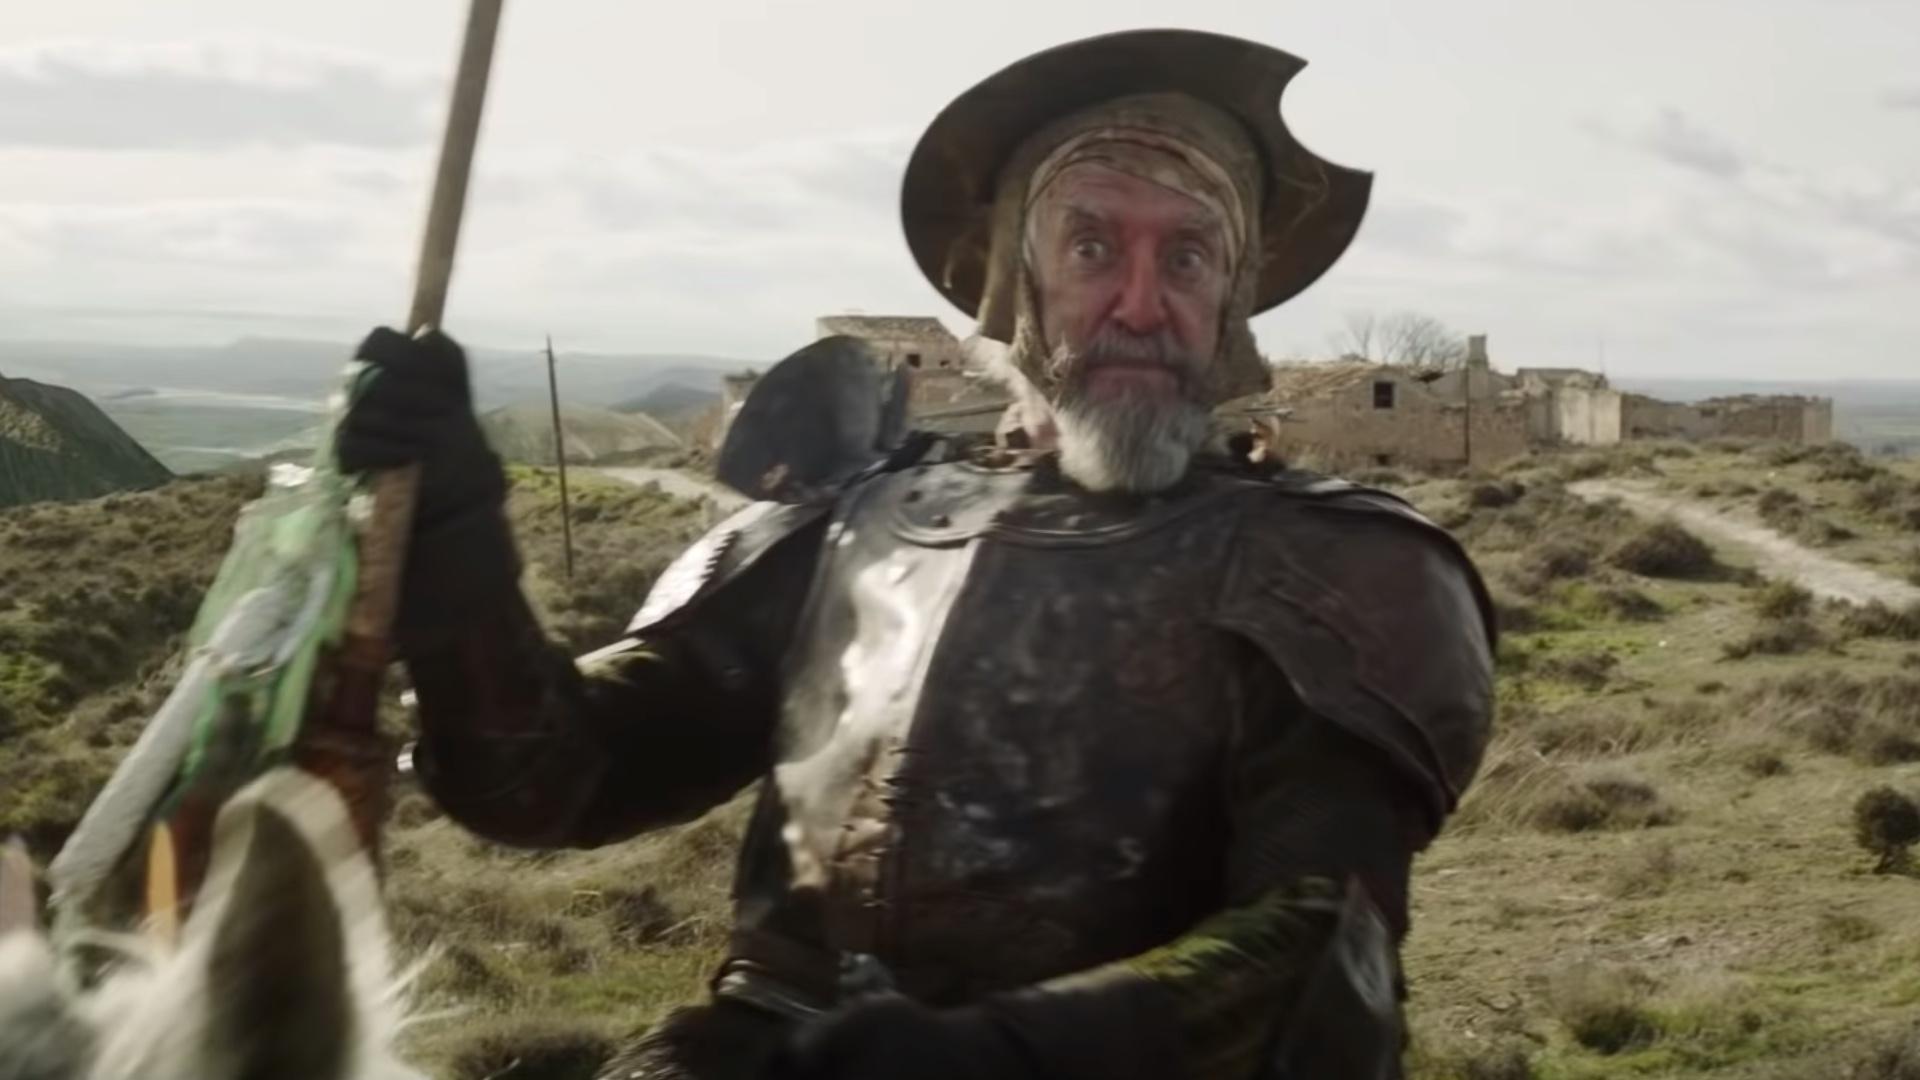 fantastic-new-trailer-for-terry-gilliams-long-awaited-film-the-man-who-killed-don-quixote-social.jpg